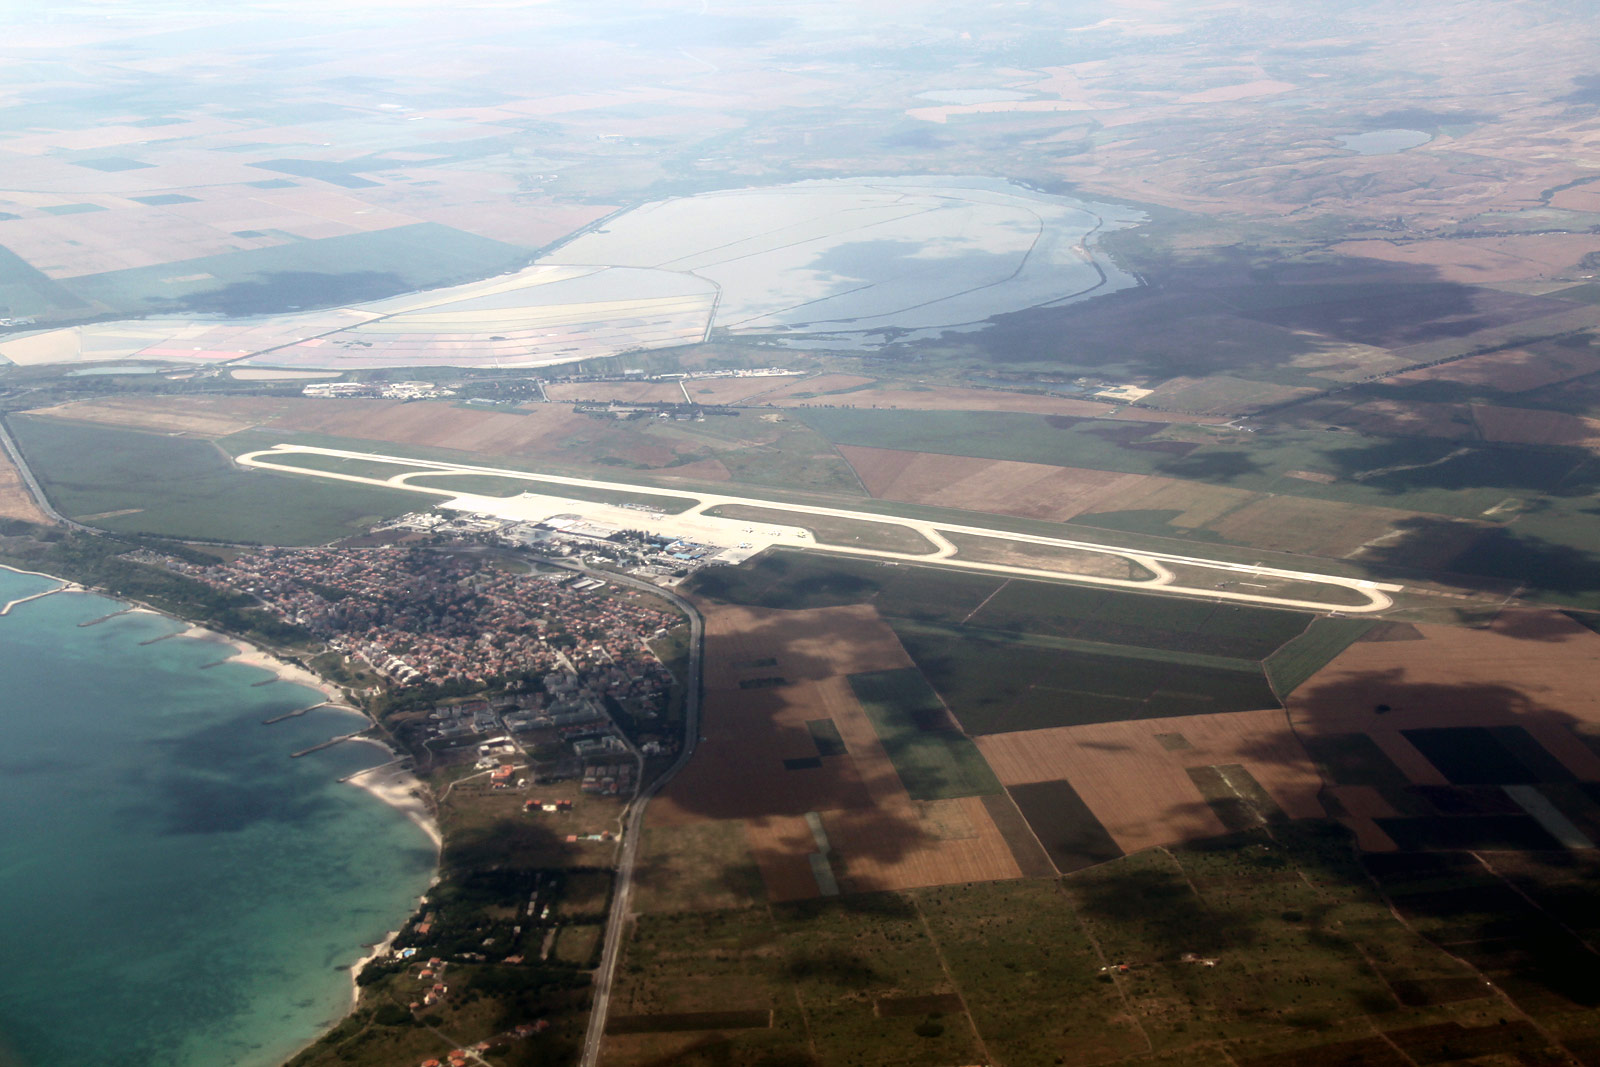 Аэропорт Бургас и поселок Сарафово в Болгарии